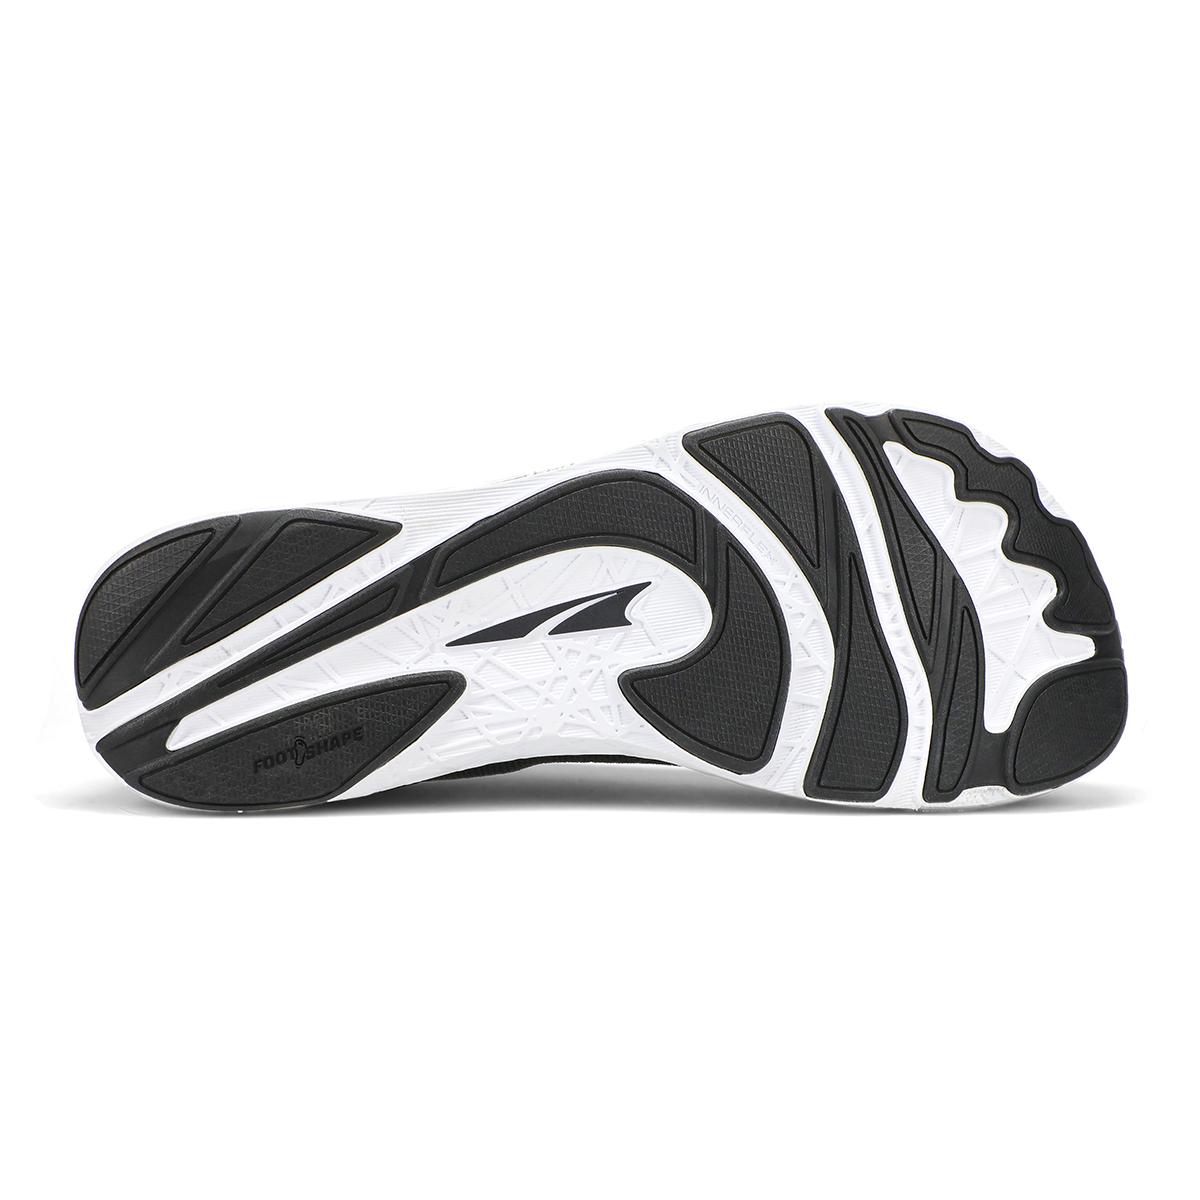 Women's Altra Escalante 2.5 Running Shoe - Color: Black - Size: 10.5 - Width: Regular, Black, large, image 3